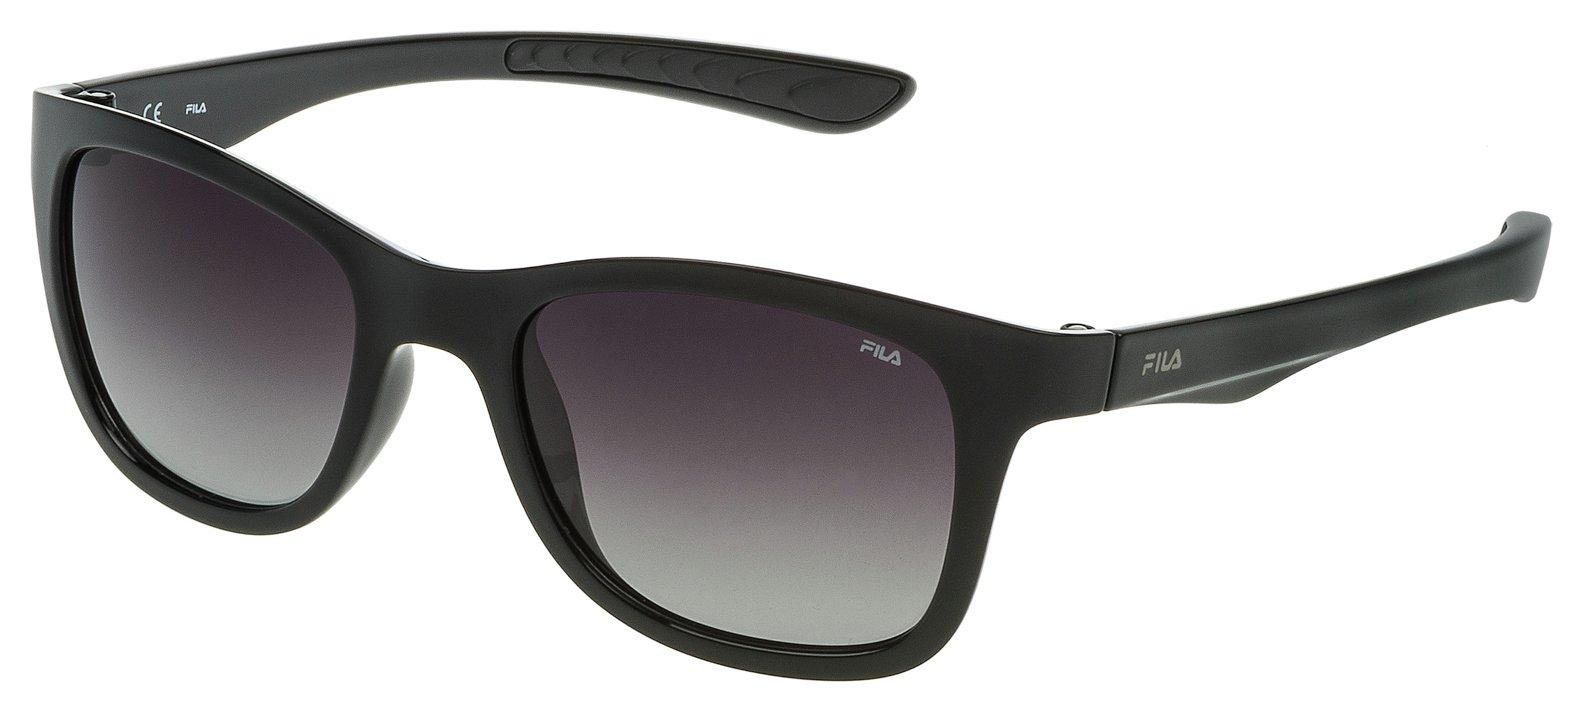 Image of Fila Black Smoke Lens Sunglasses.